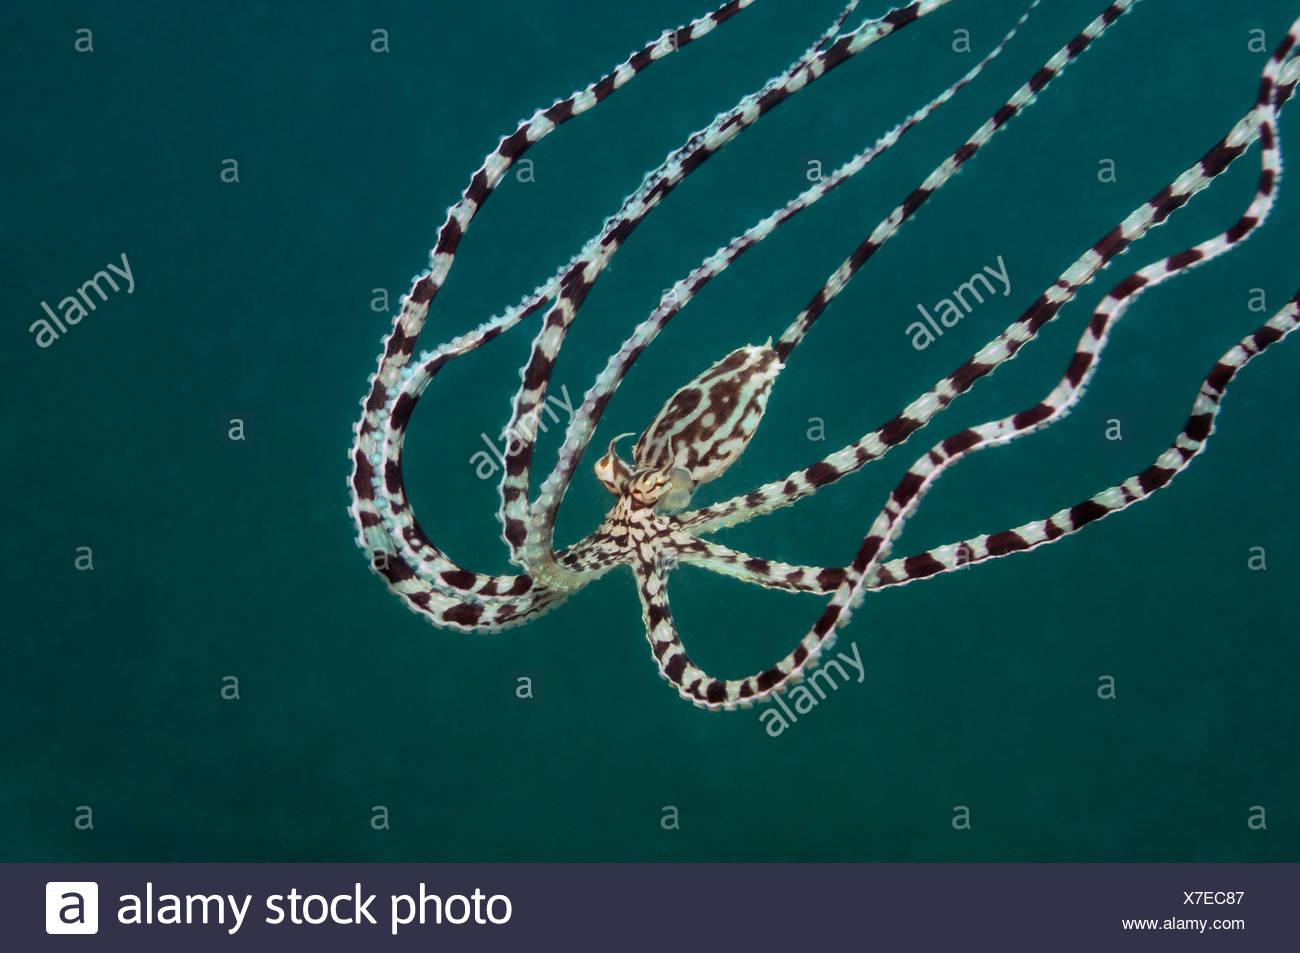 Mimic Octopus, Thaumoctopus mimicus, Lembeh Strait, Sulawesi, Indonesia - Stock Image